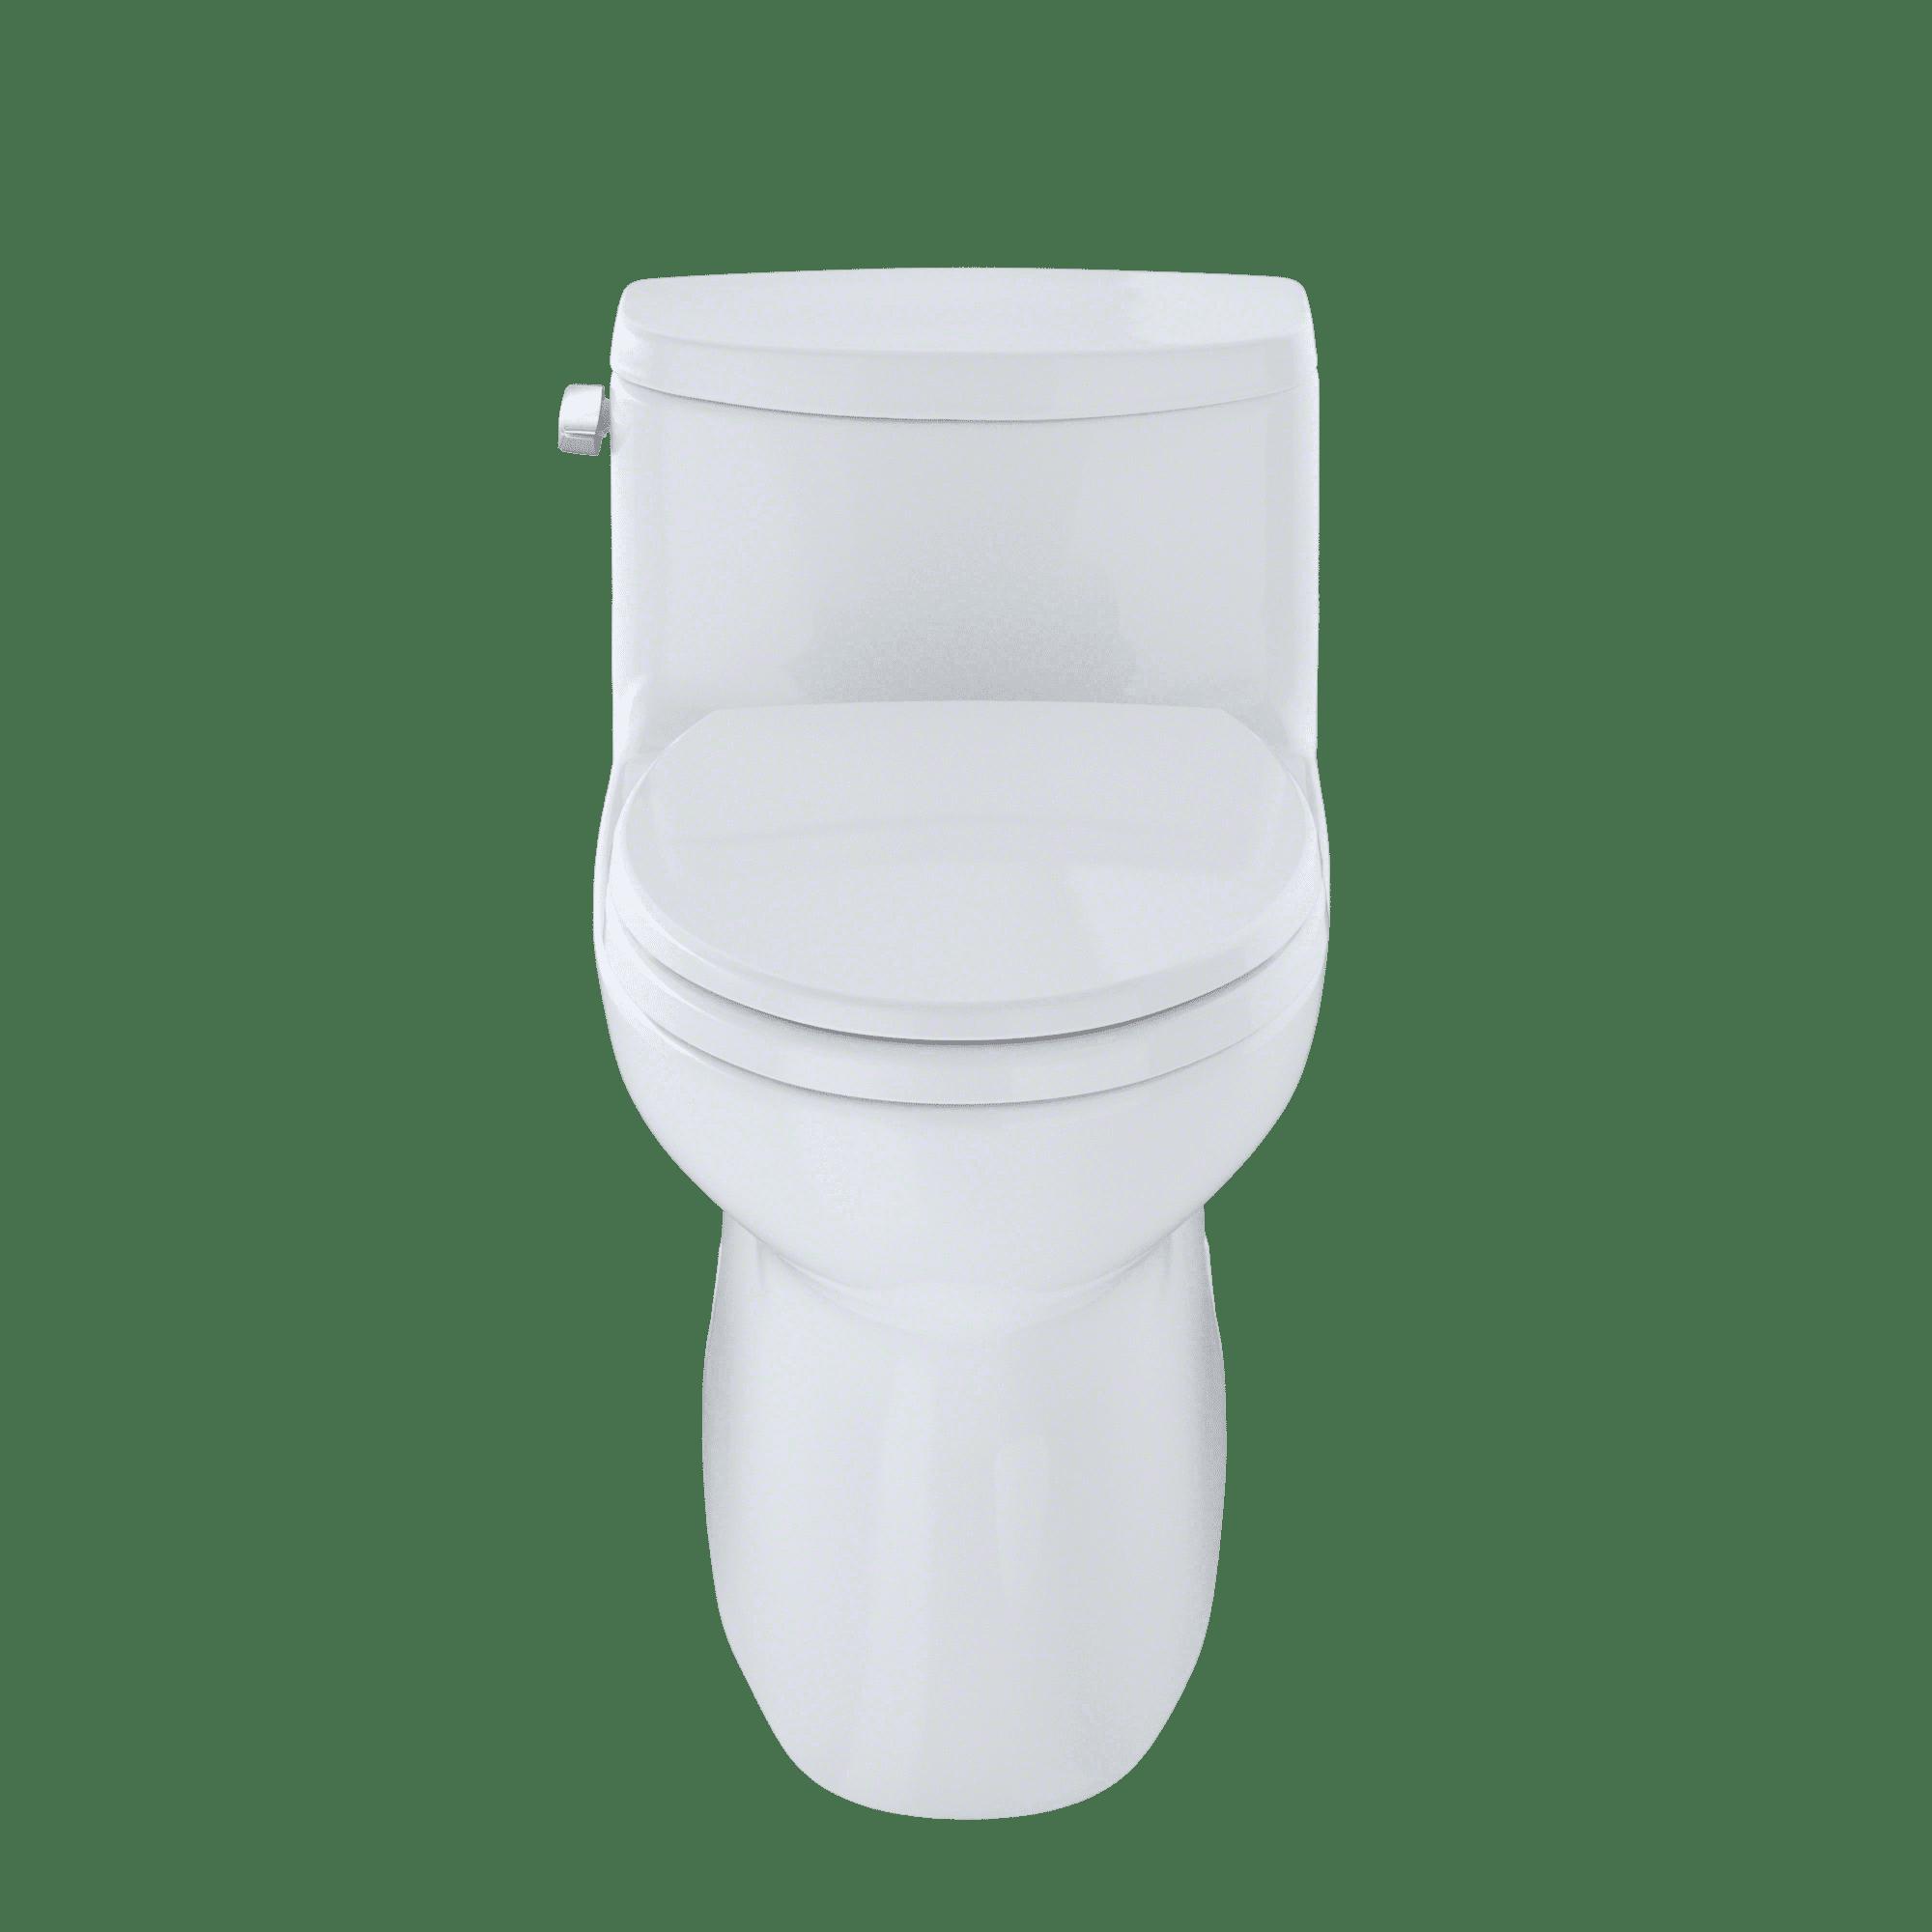 Pleasing Toto Carolina Ii One Piece Elongated 1 28 Gpf Universal Height Skirted Toilet With Cefiontect Cotton White Ms644114Cefg01 Creativecarmelina Interior Chair Design Creativecarmelinacom